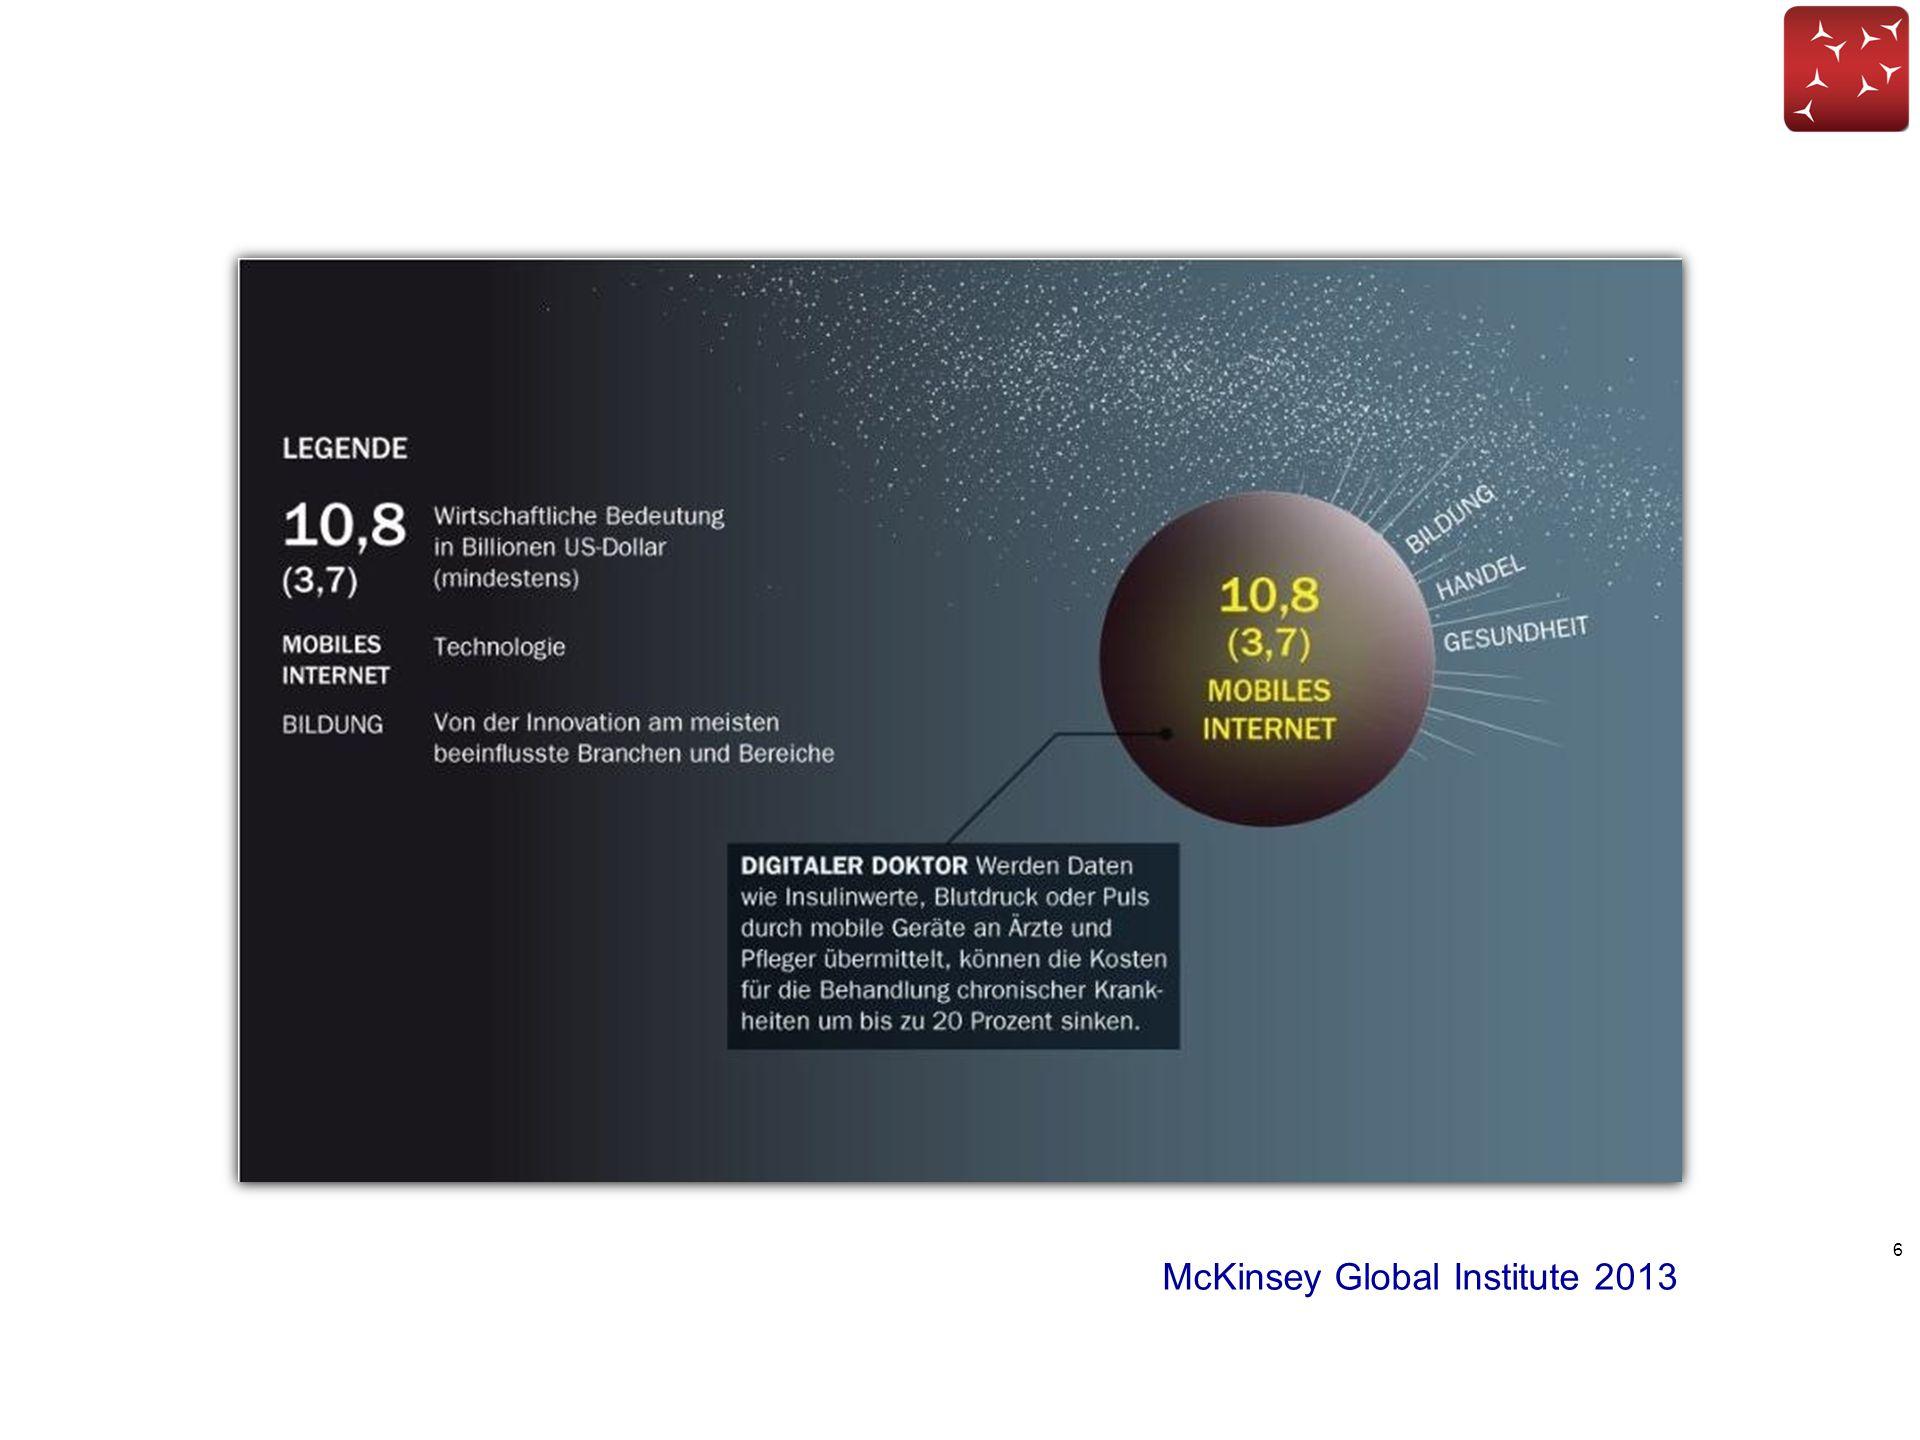 McKinsey Global Institute 2013